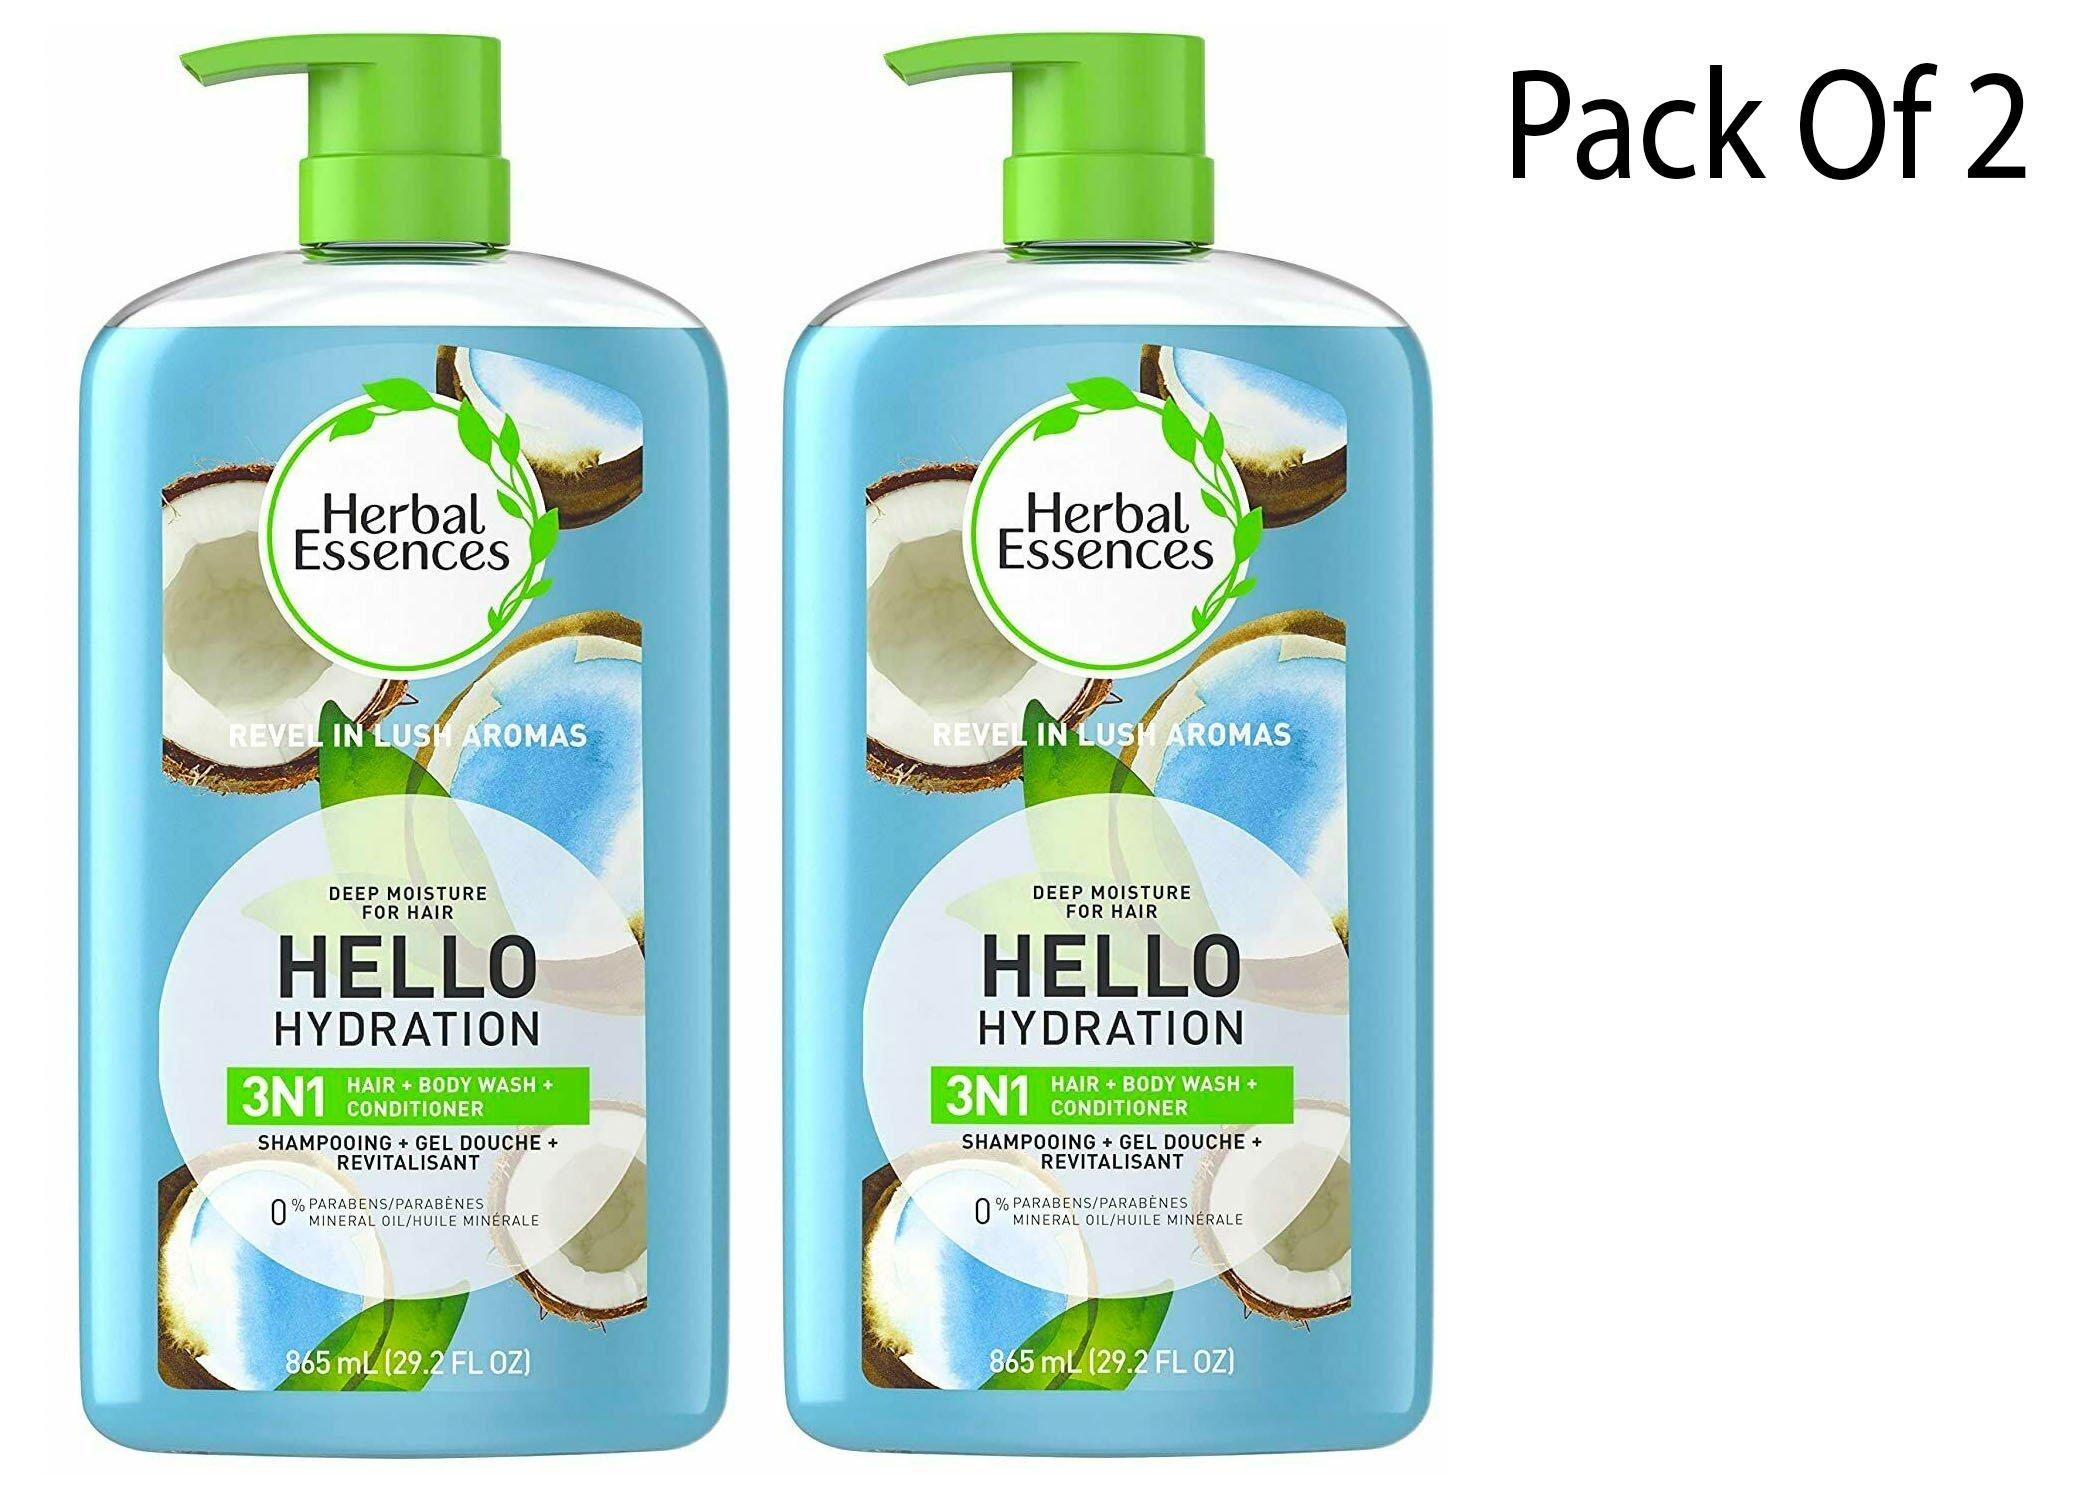 Herbal Essences 3 in1 shampoo, conditioner body wash 29.2 fl